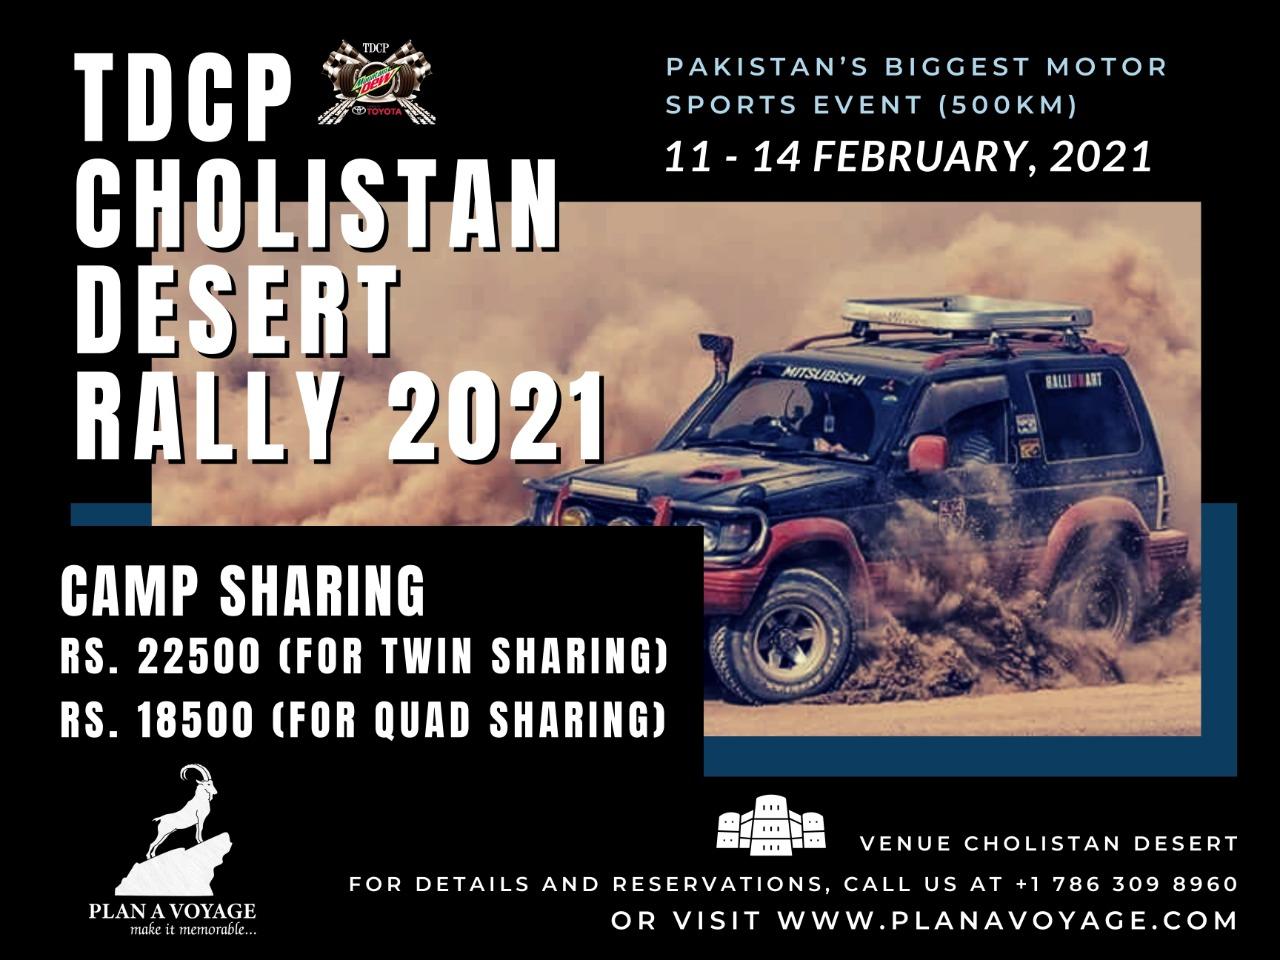 TDCP Cholistan Desert Rally